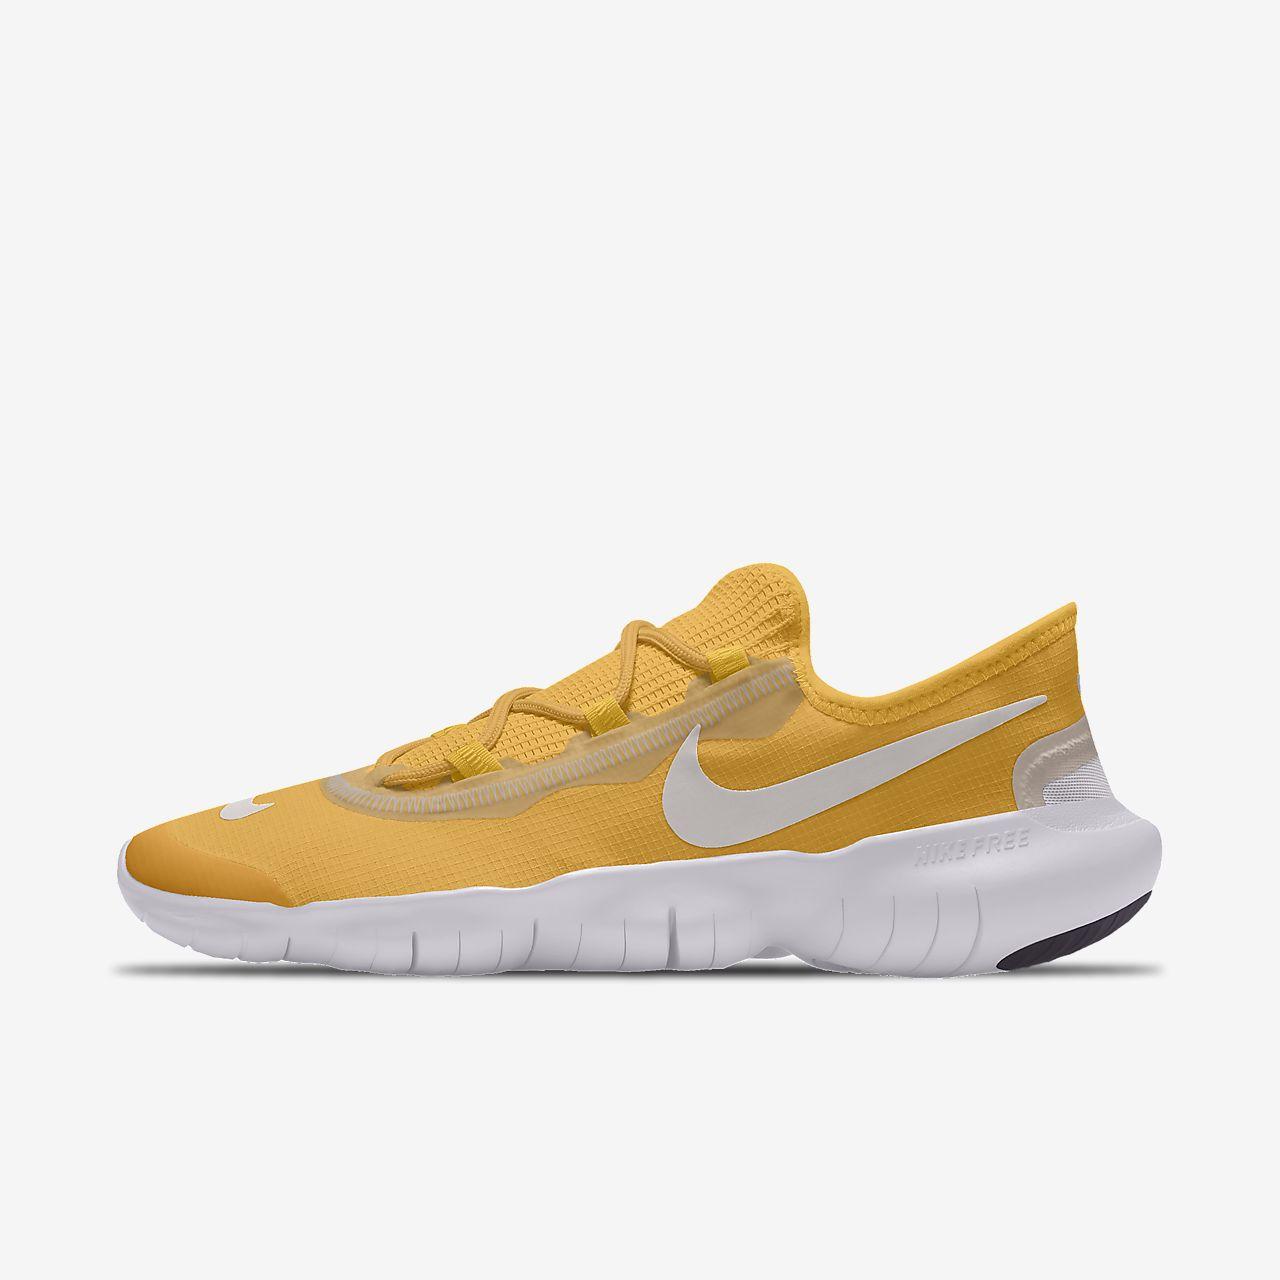 Calzado de running para hombre personalizado Nike Free RN 5.0 By You